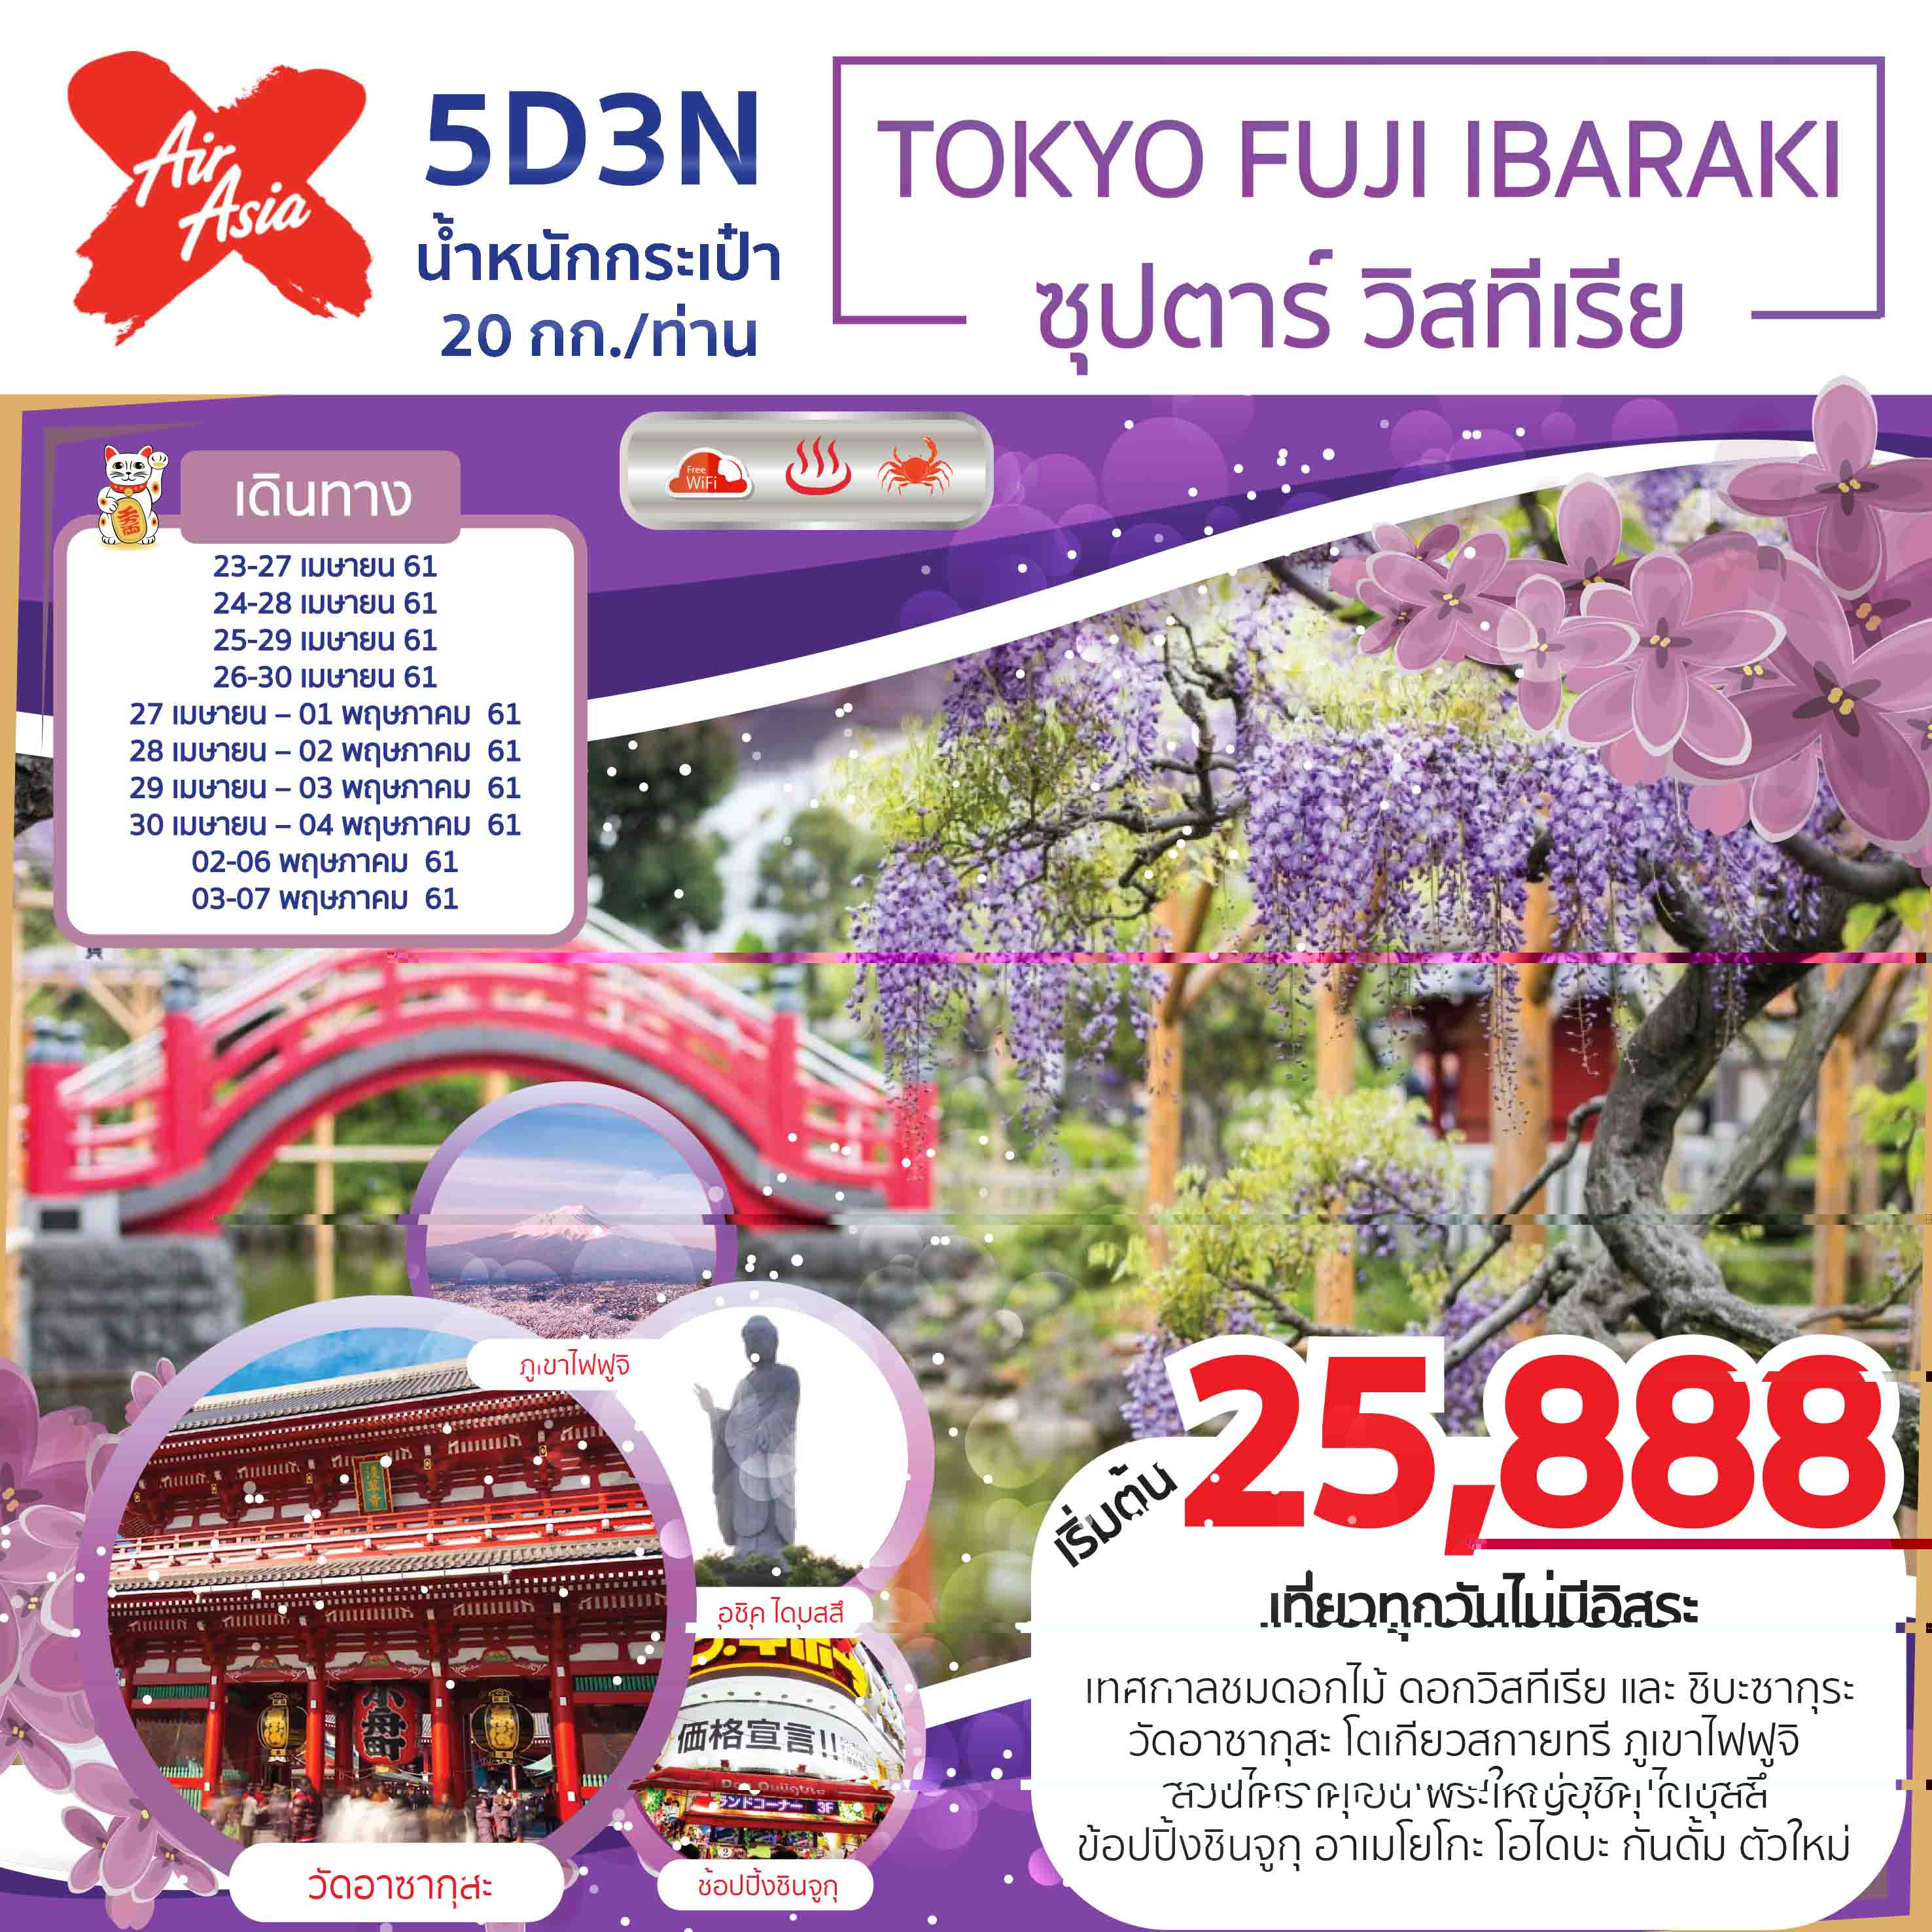 TOKYO FUJI IBARAKI 5D3N (ซุปตาร์ วิสทีเรีย)